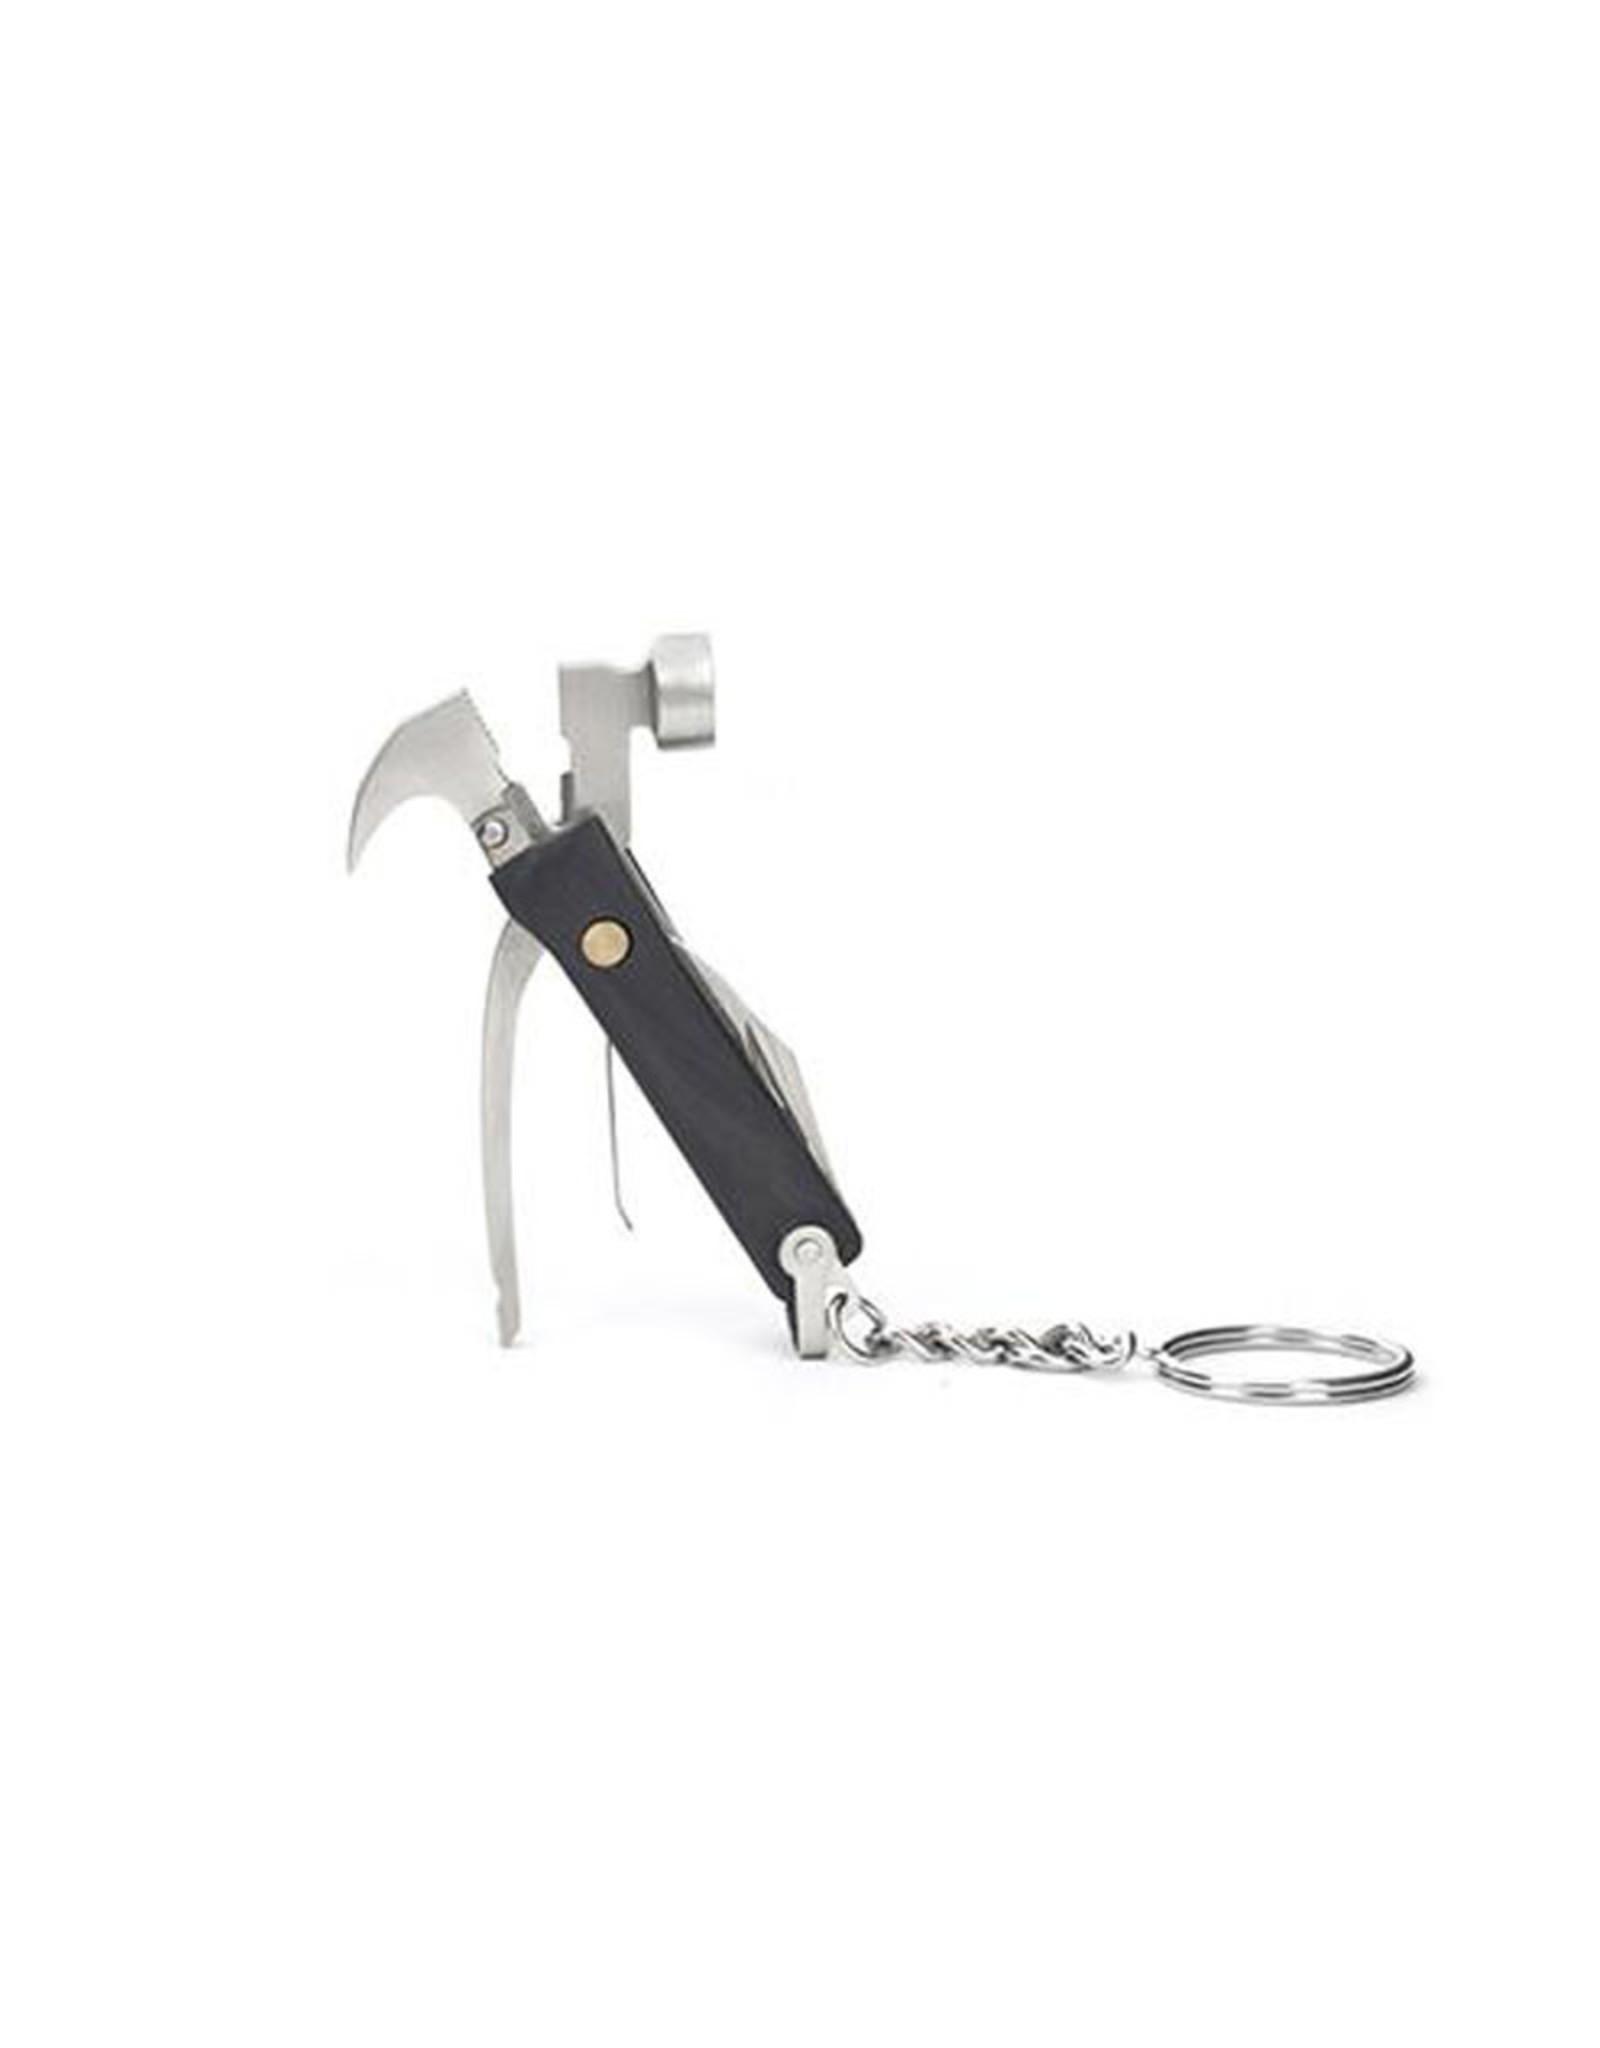 Kikkerland KR13-BK Mini Black Hammer Tool Keychain